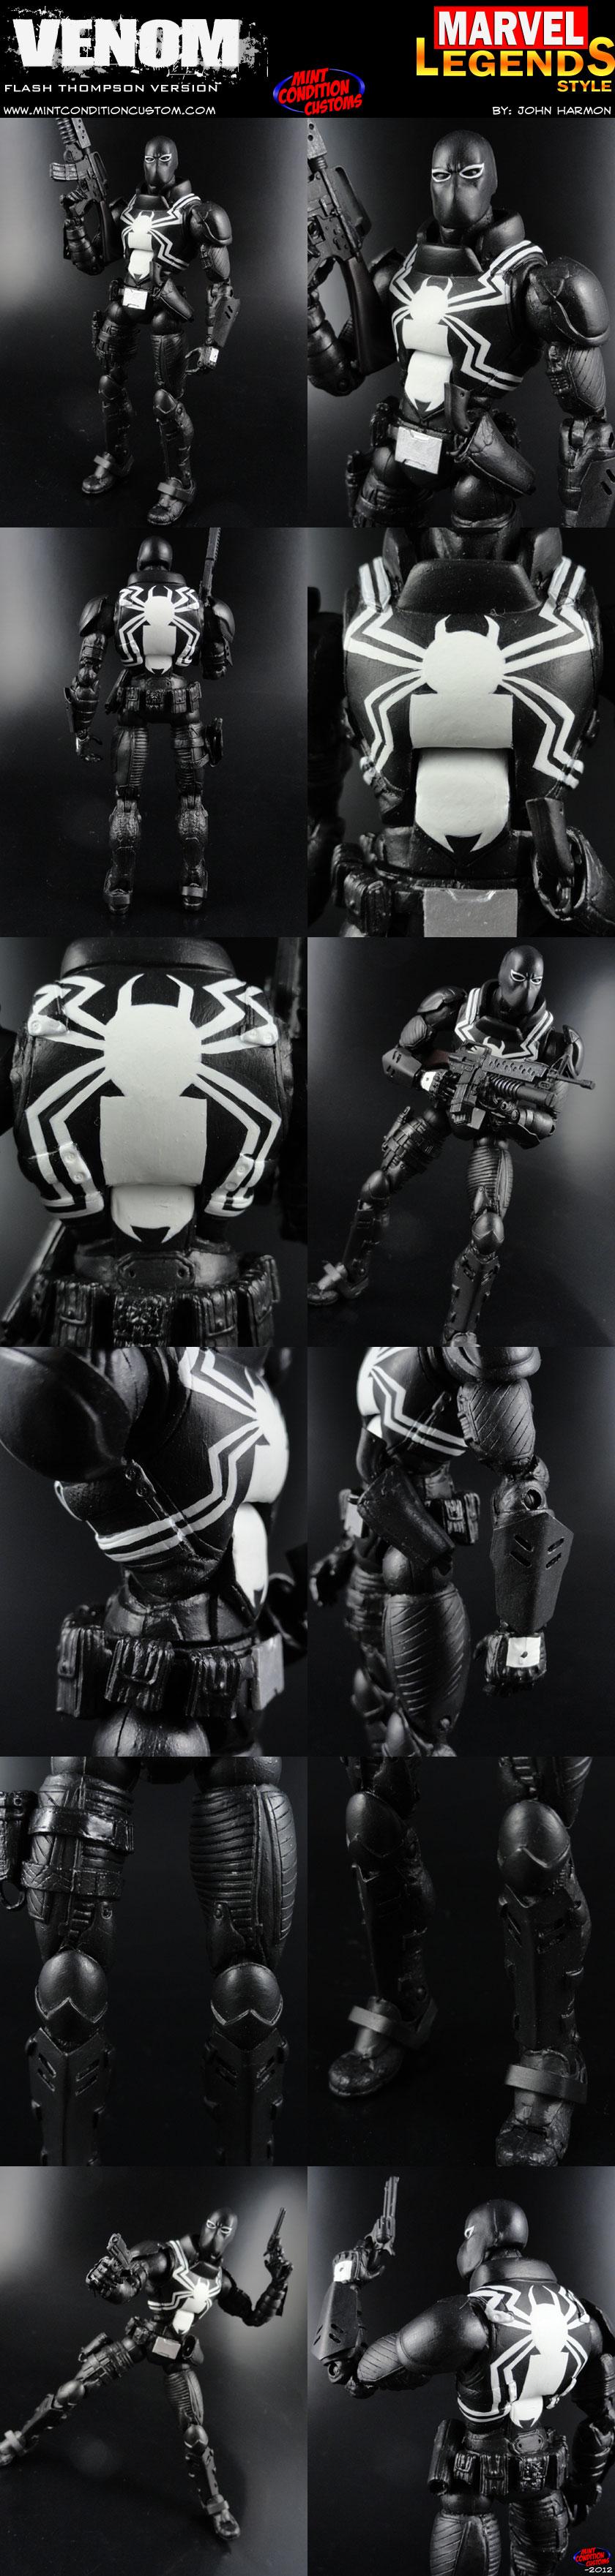 Custom Flash Thompson Venom Action Figure by MintConditionStudios